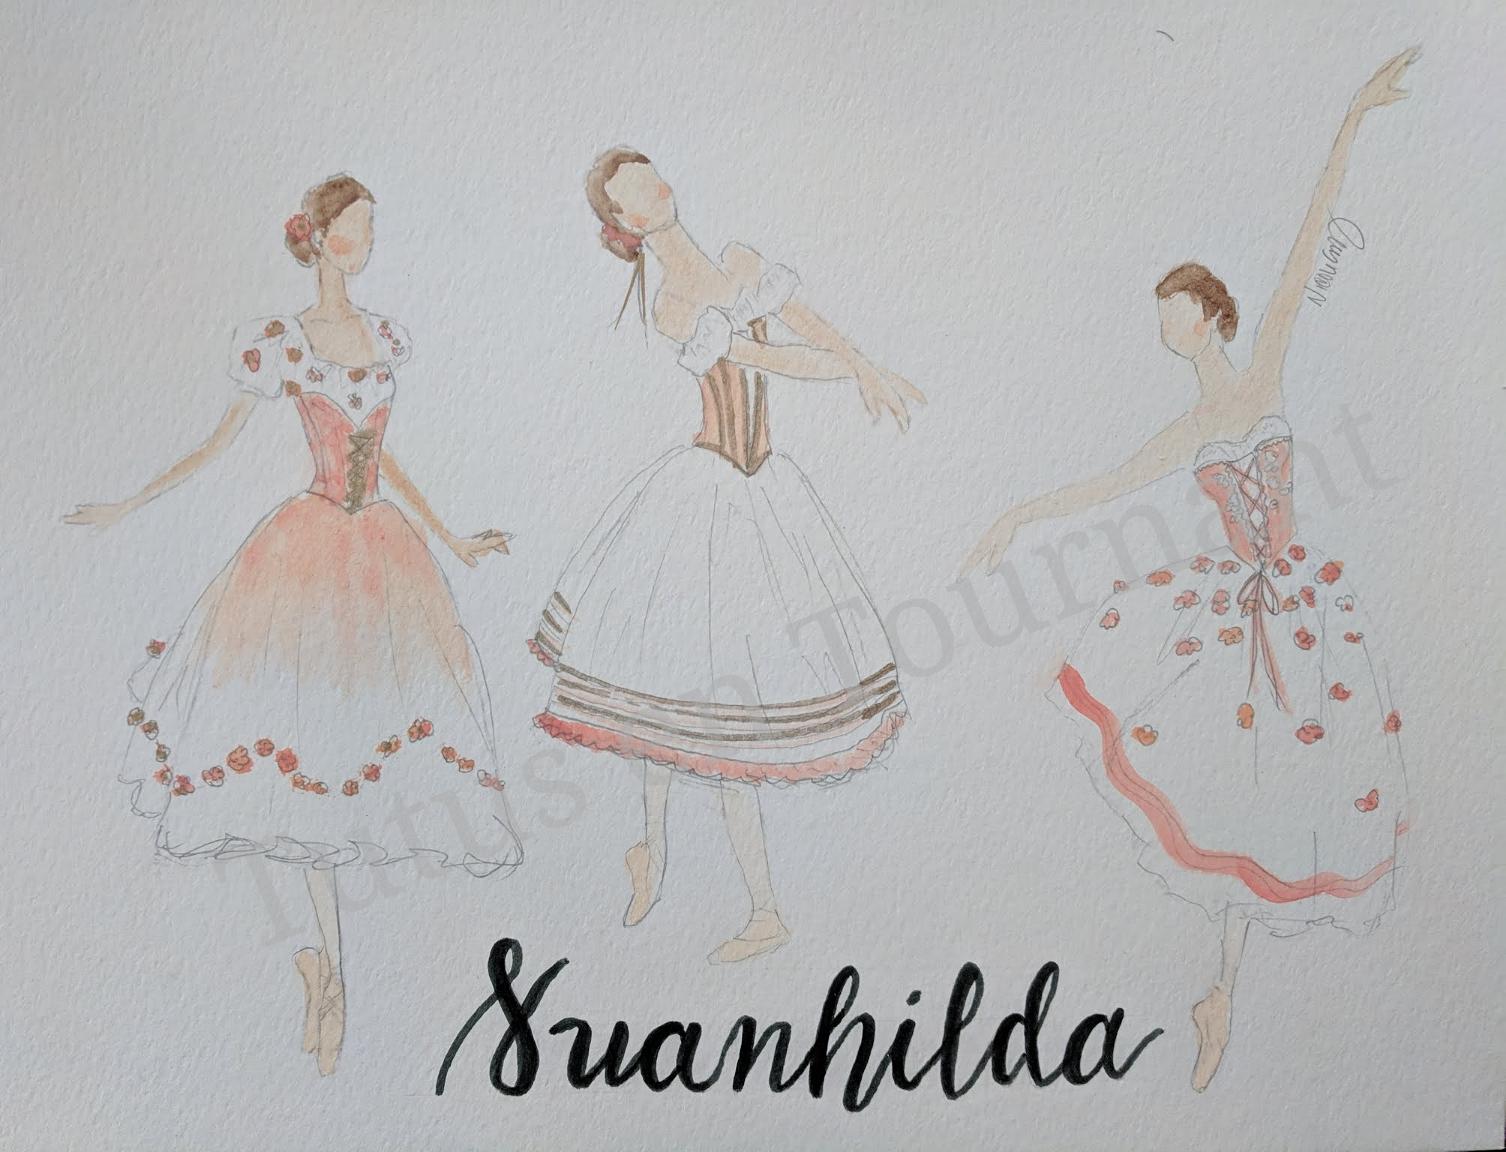 Swanhilda